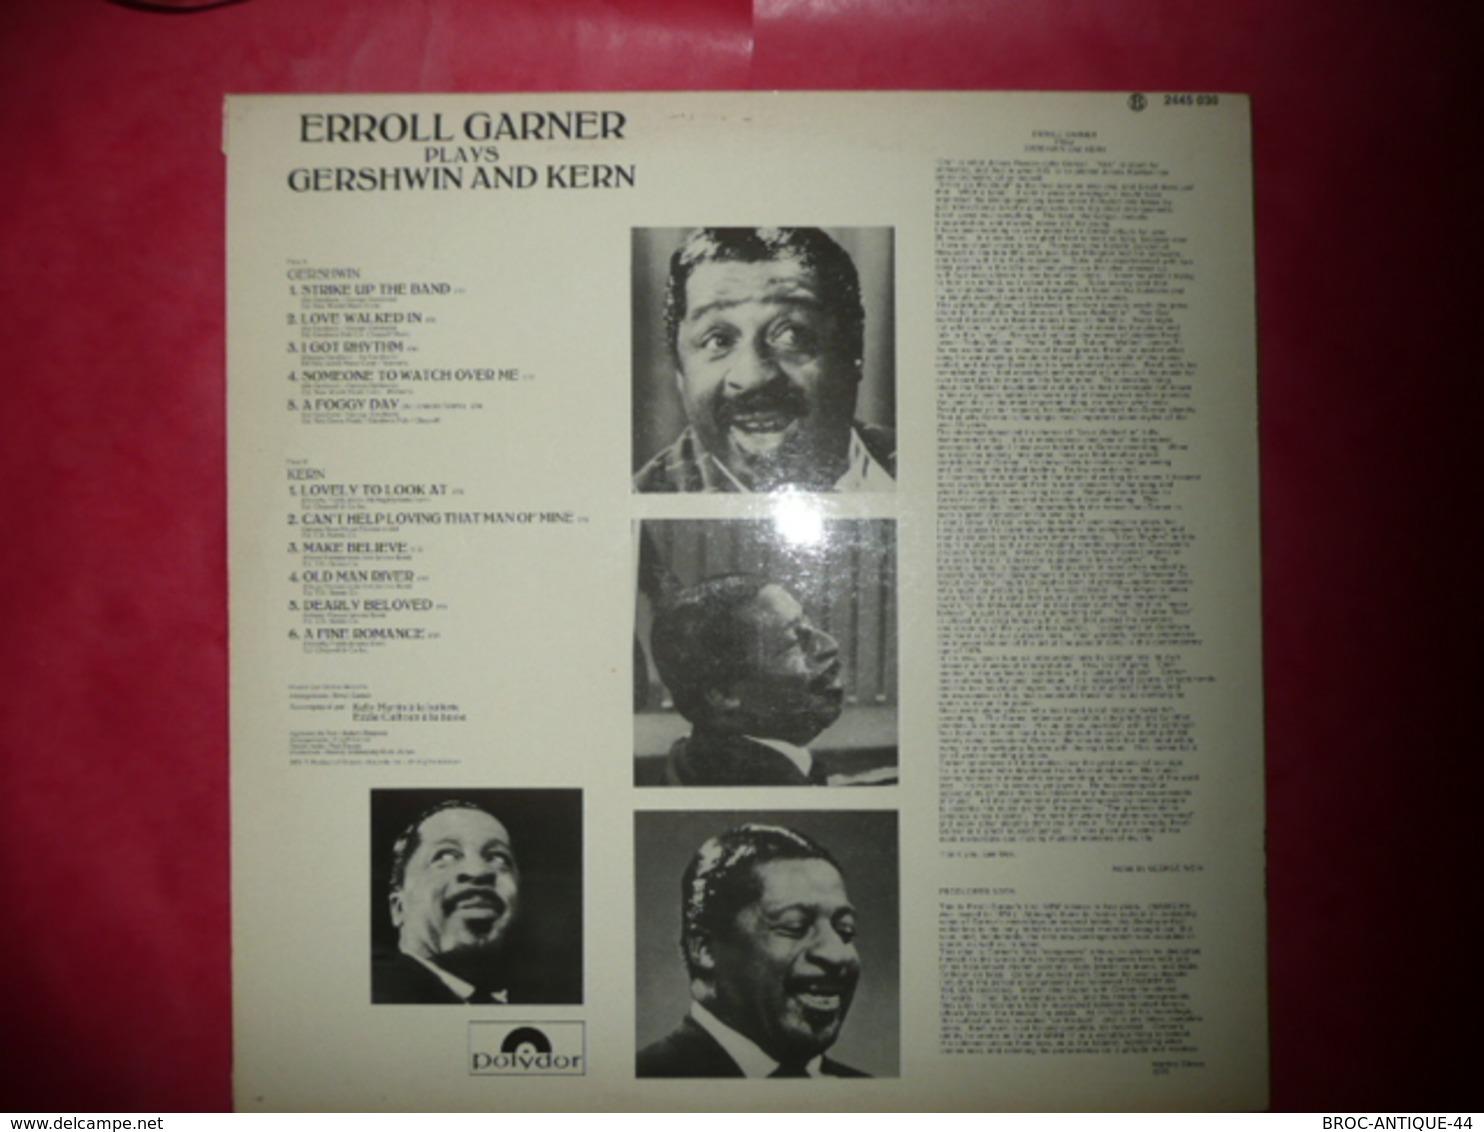 LP33 N°2933 - ERROLL GARNER - PLAYS GERSHWIN & KERN - 2445 030 - DISQUE TRES EPAIS ***** - Jazz